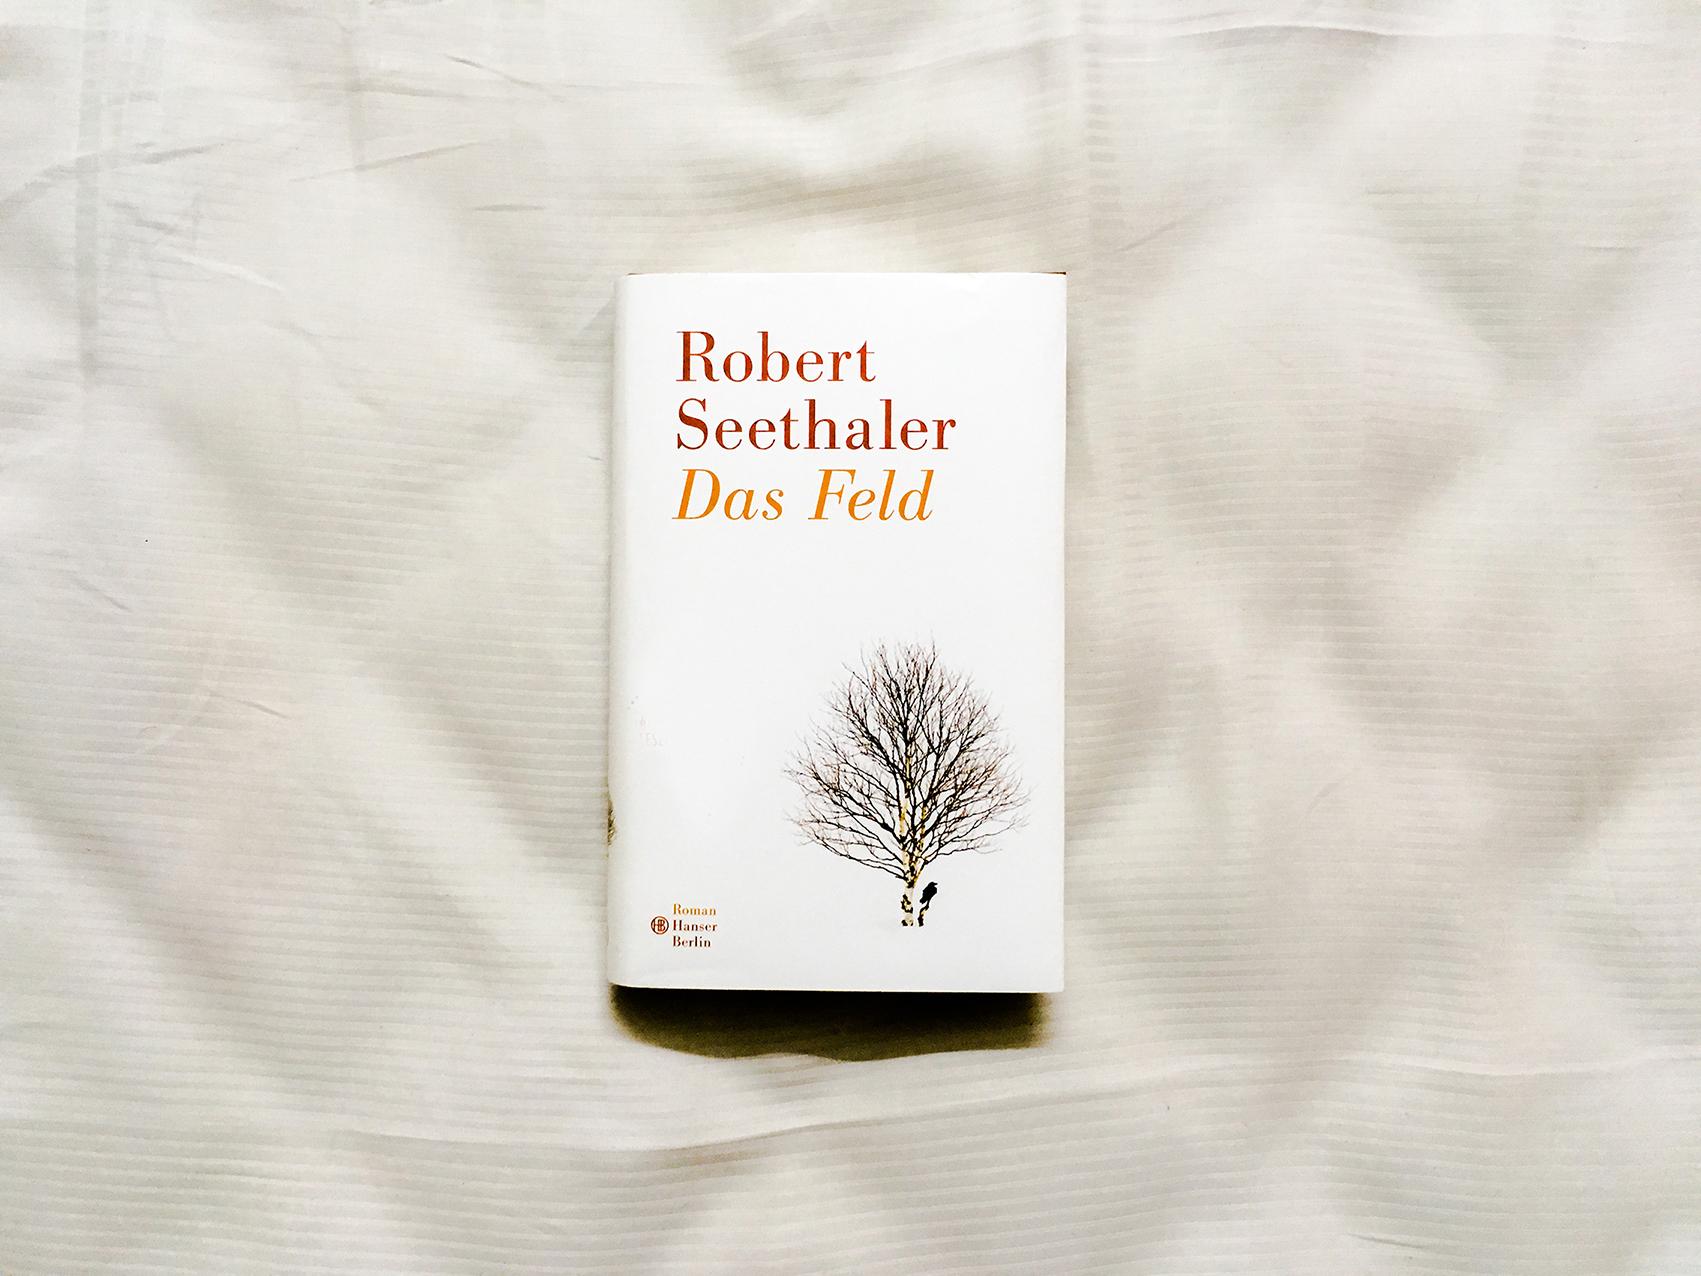 Rober Seethaler: Das Feld